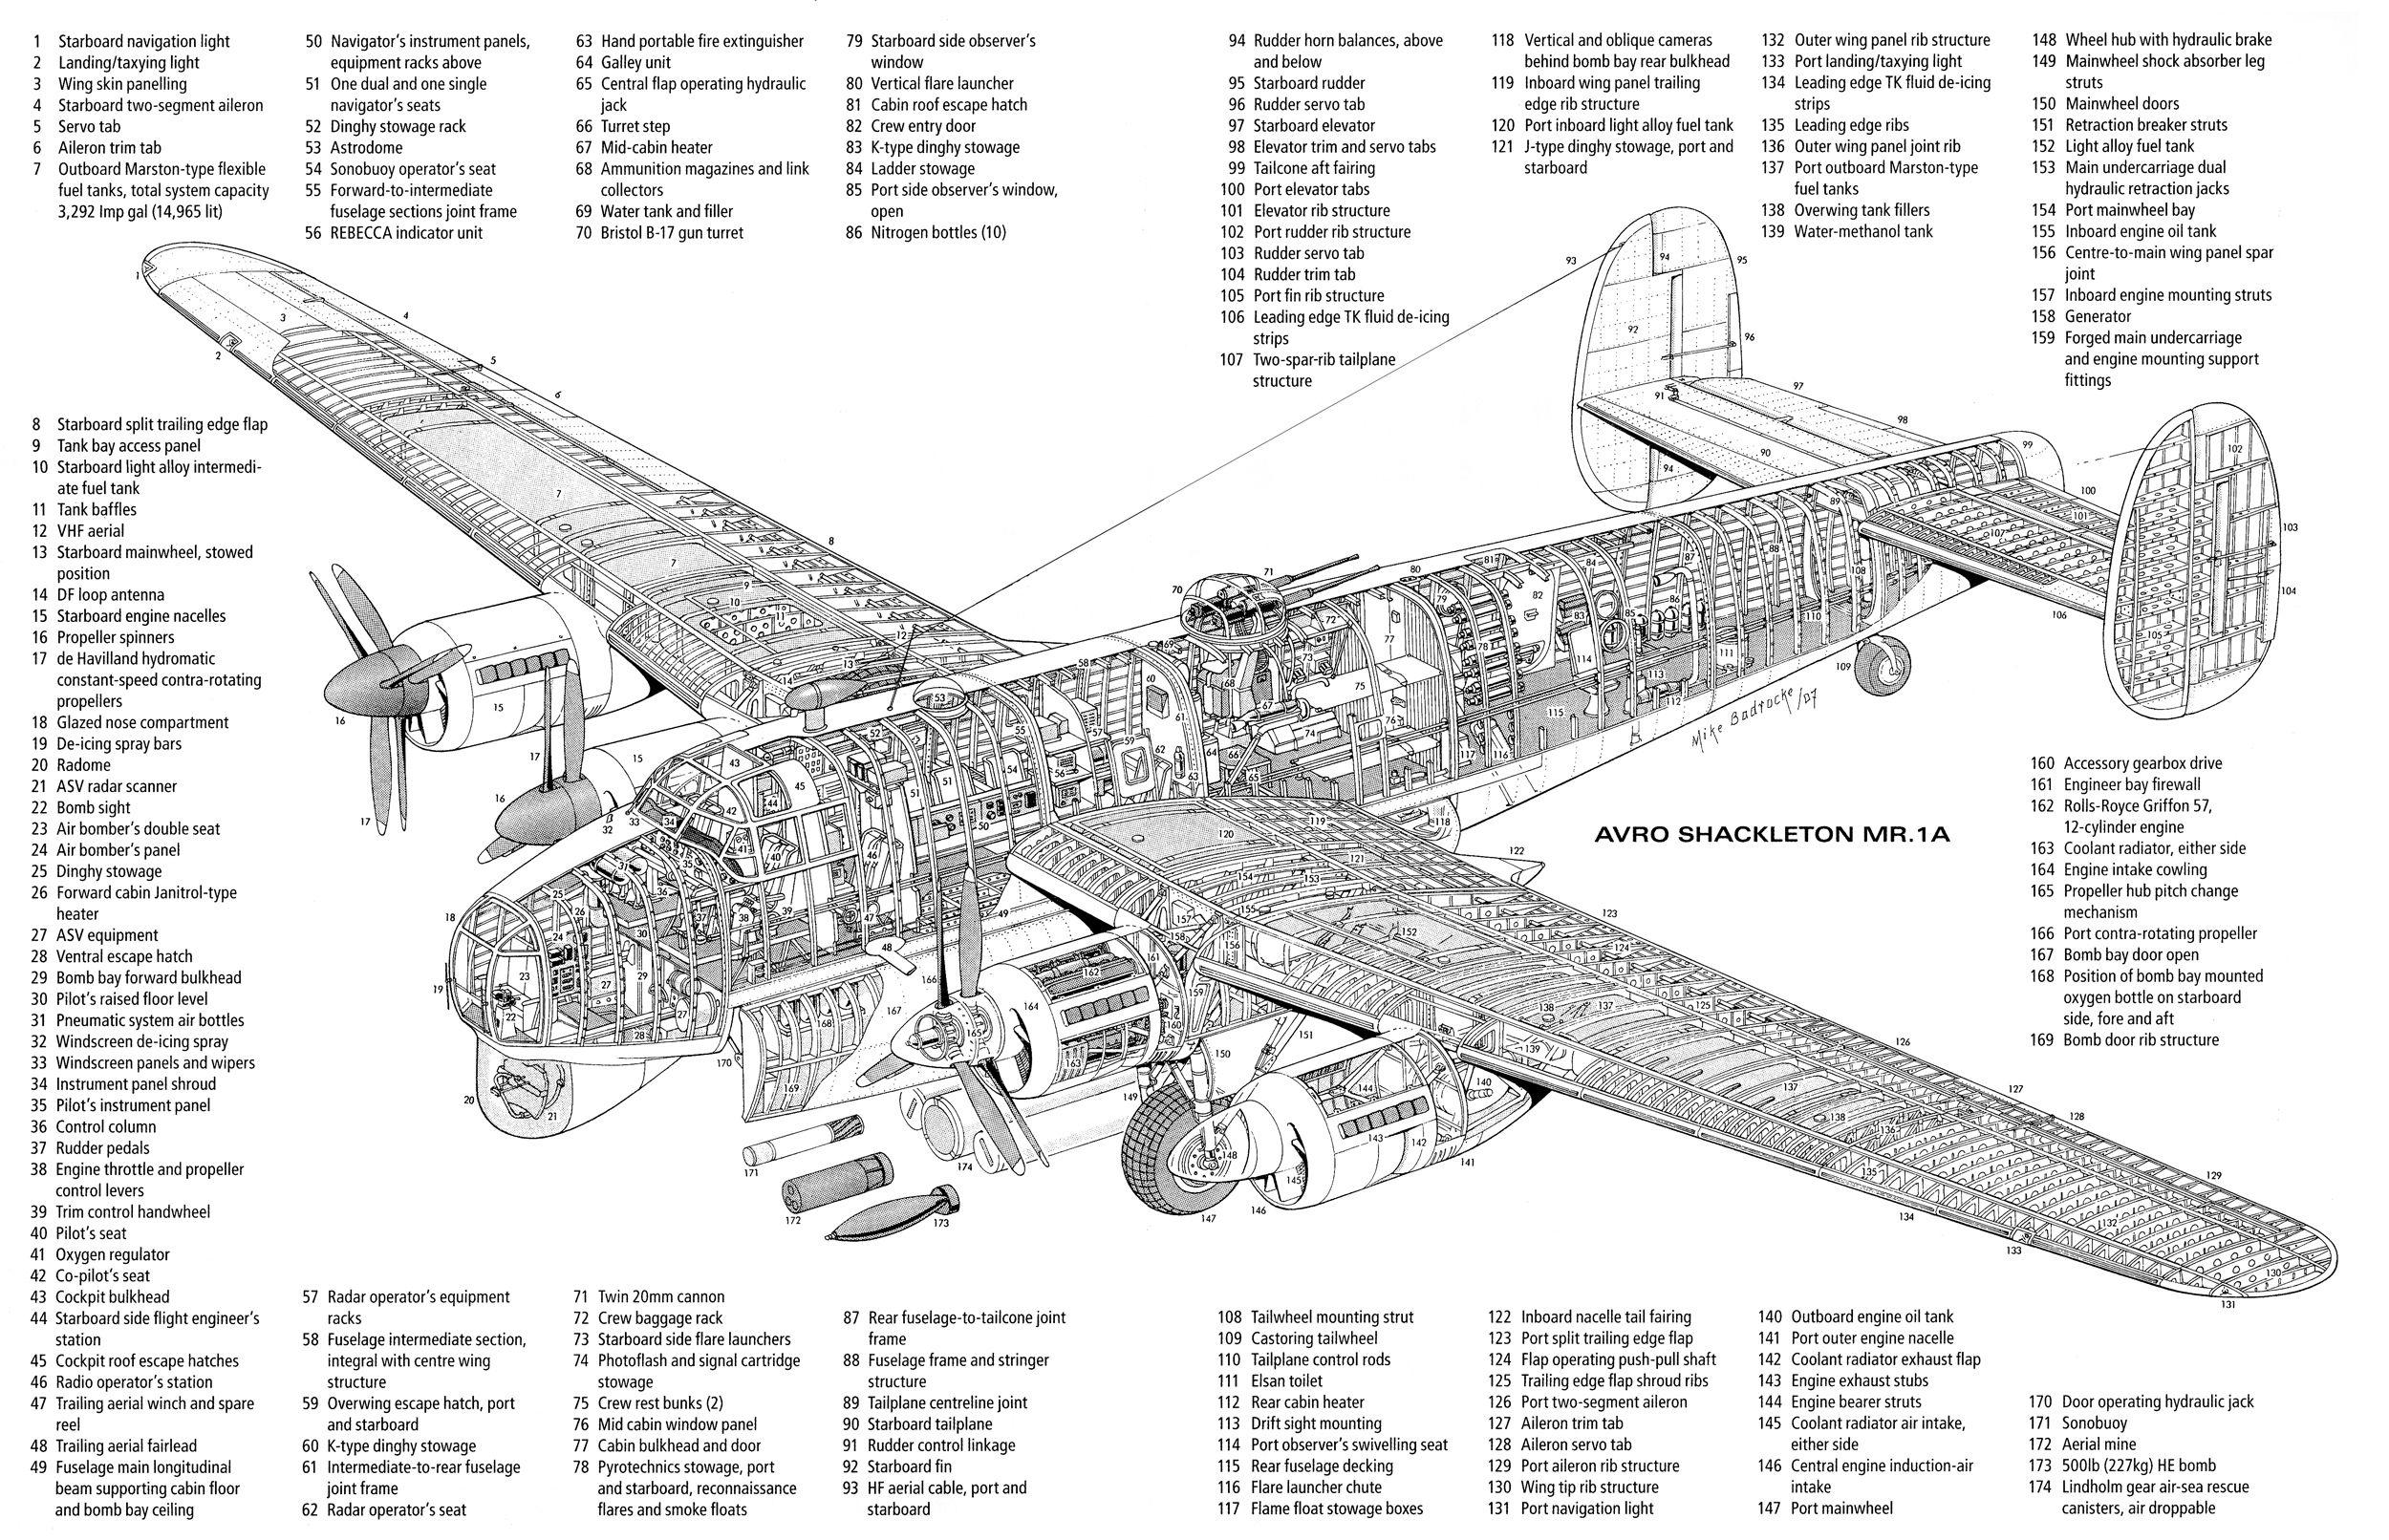 Image Result For Avro Shackleton